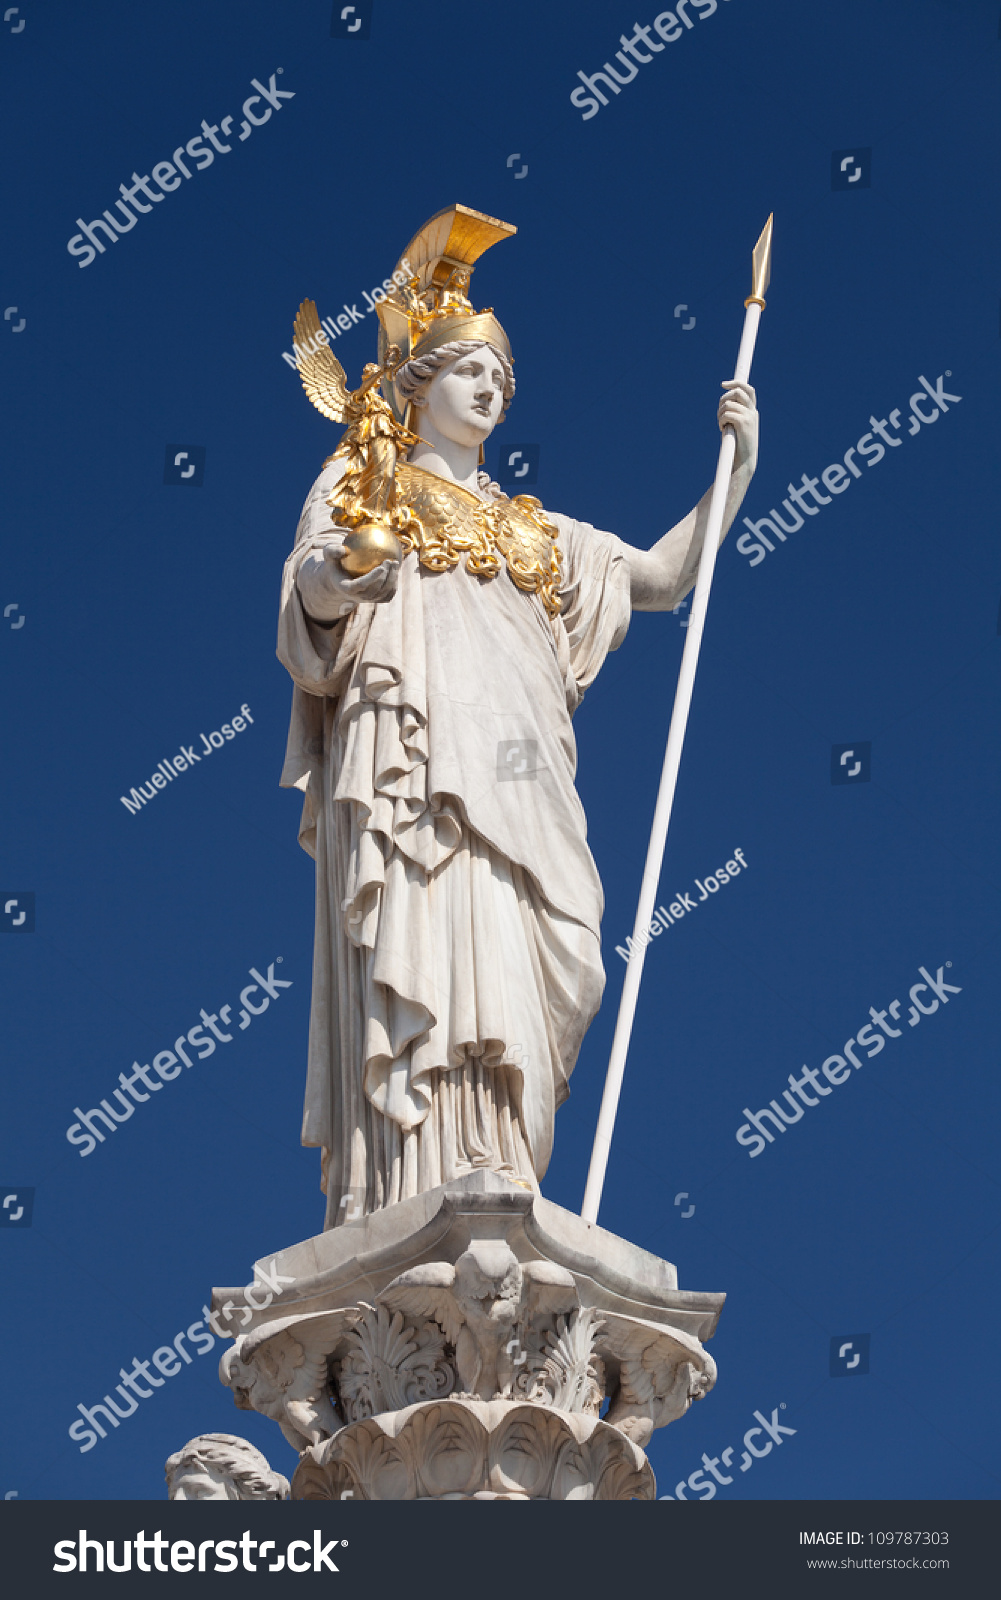 Athena goddess greek mythology symbol law stock photo 109787303 athena goddess of greek mythology symbol for law and justice biocorpaavc Images